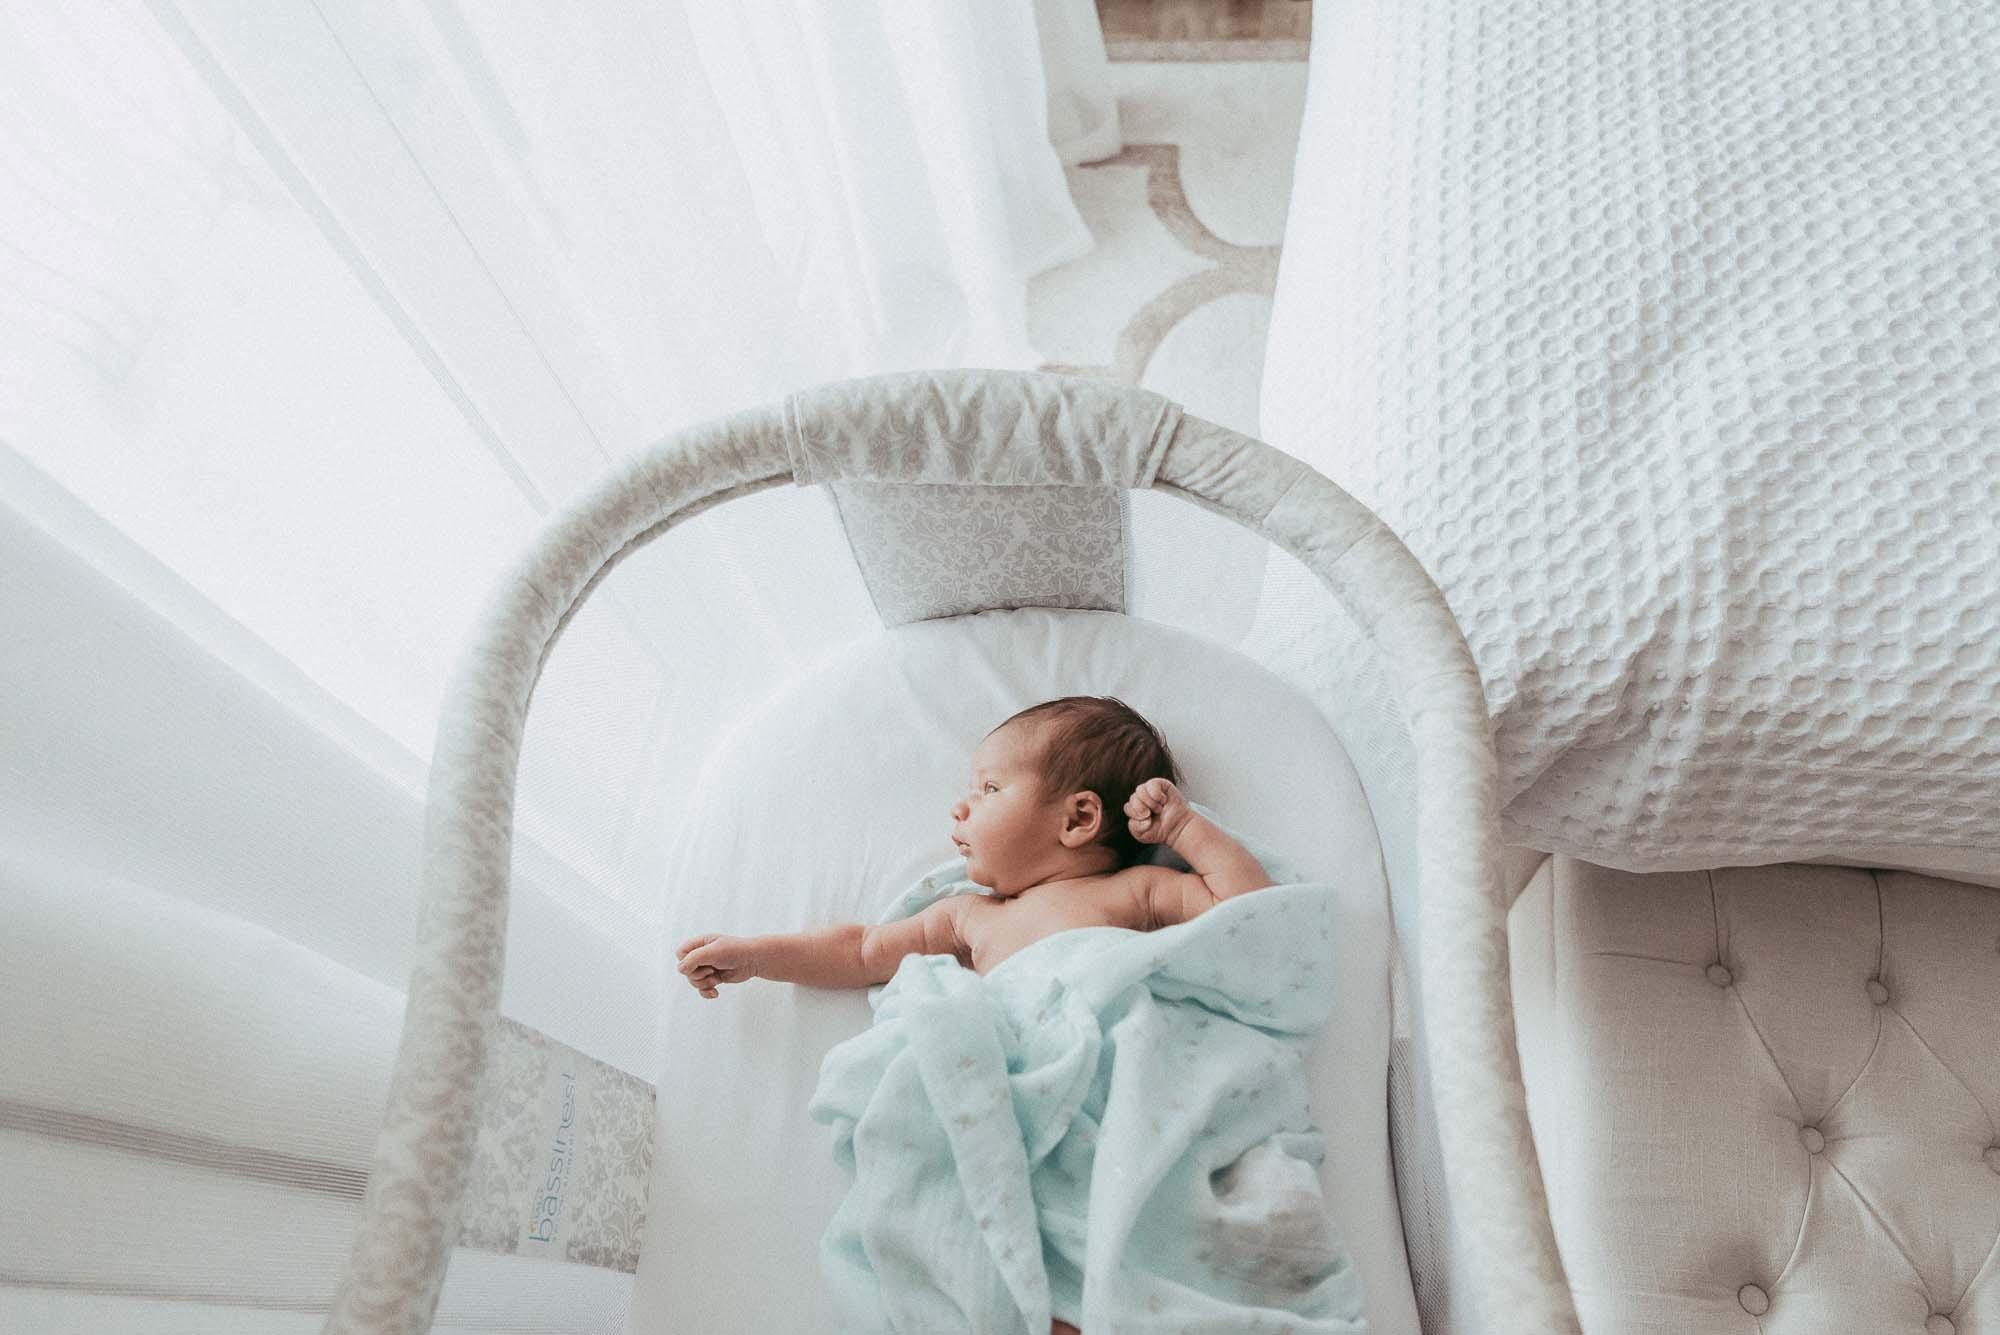 newborn-by-olgalevien-93 copy.jpg